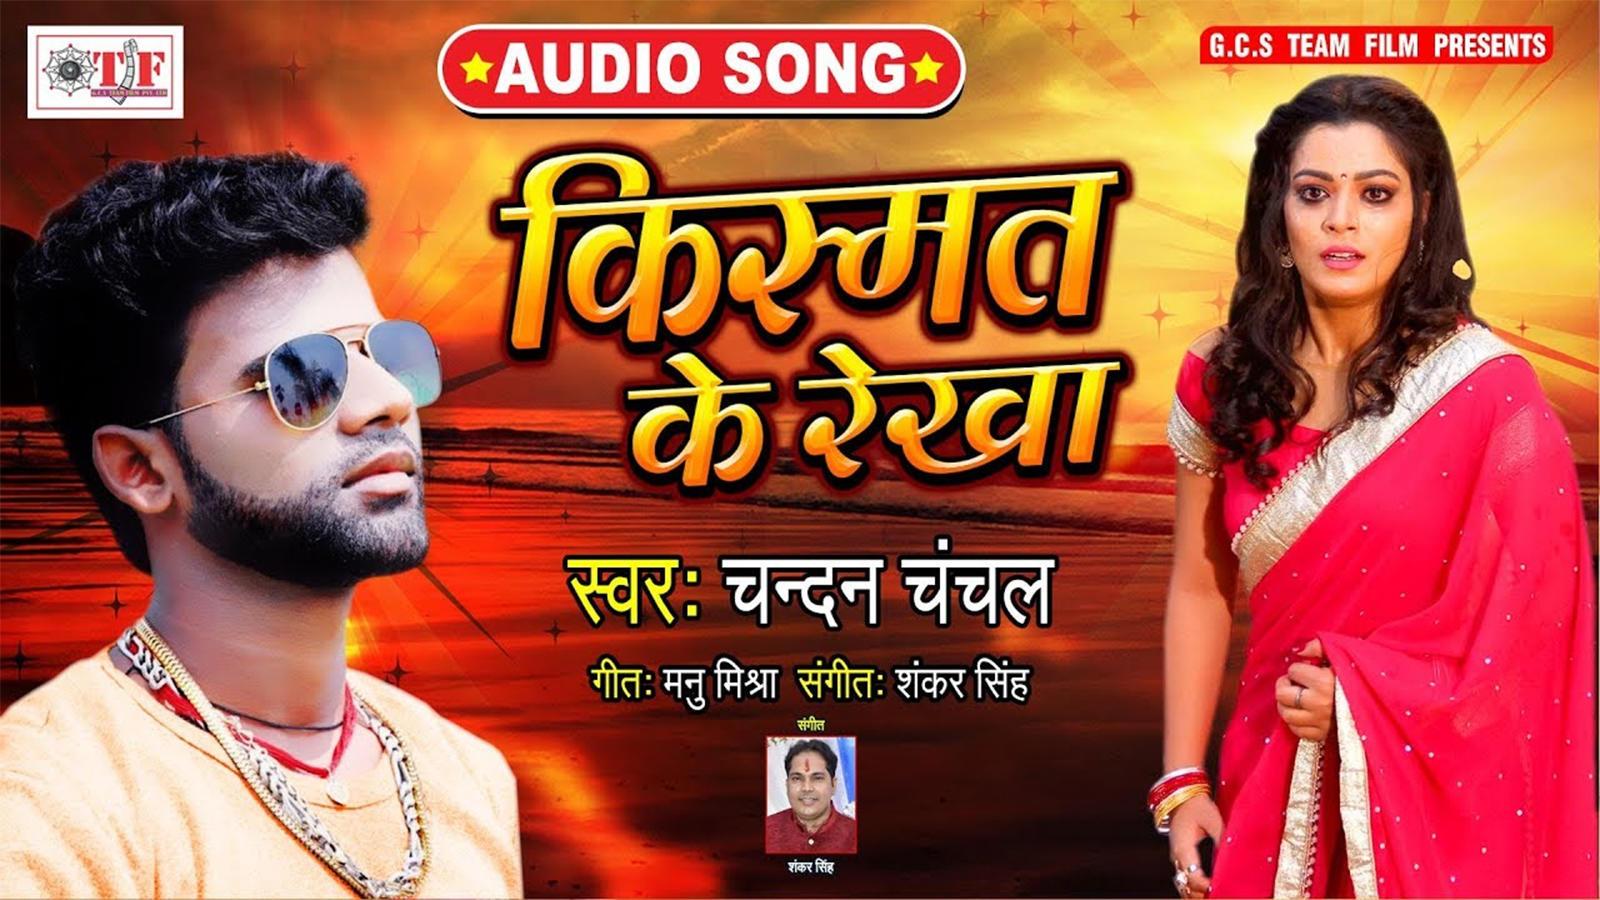 Latest Bhojpuri Song 'Kismat Ke Rekha' (Audio) Sung By Chandan Chanchal